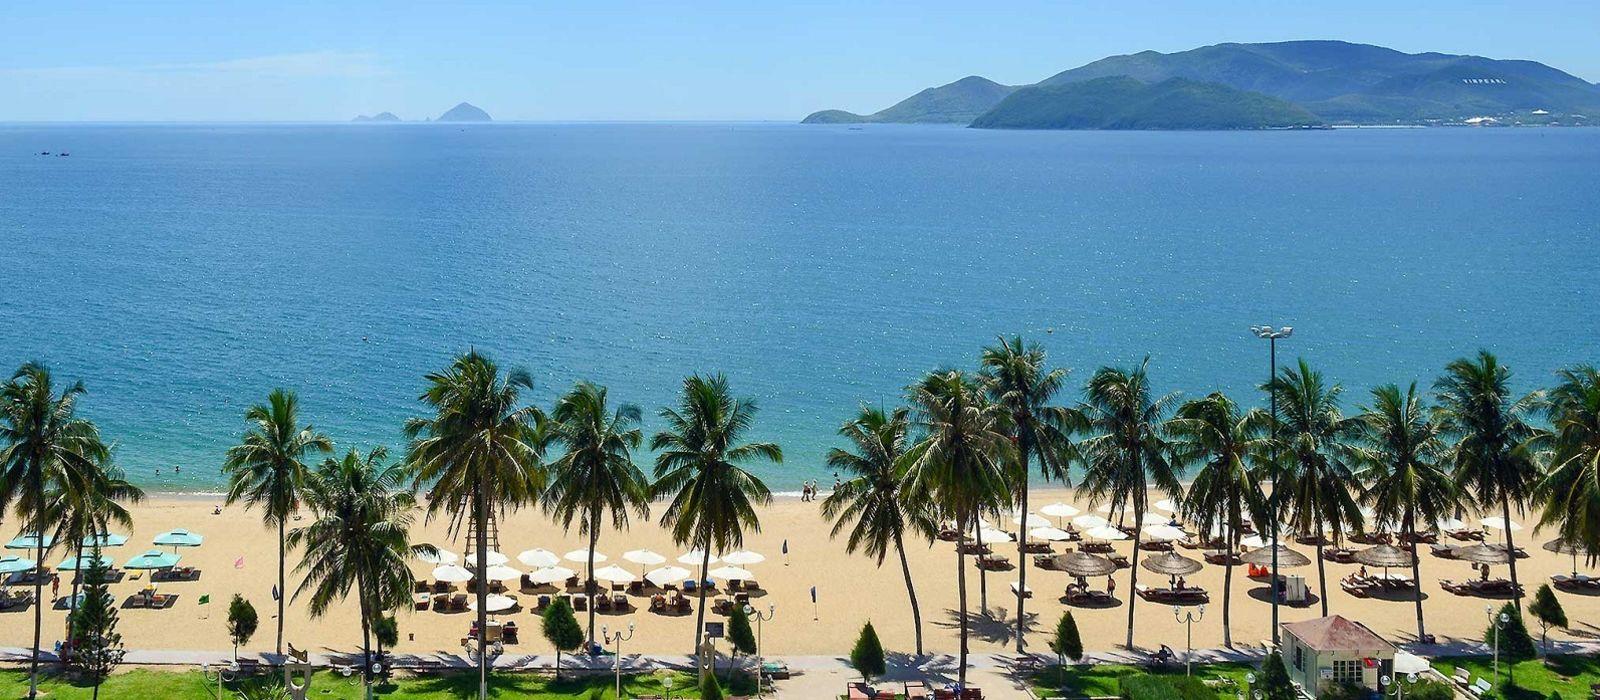 Hotel Novotel (Nha Trang) Vietnam